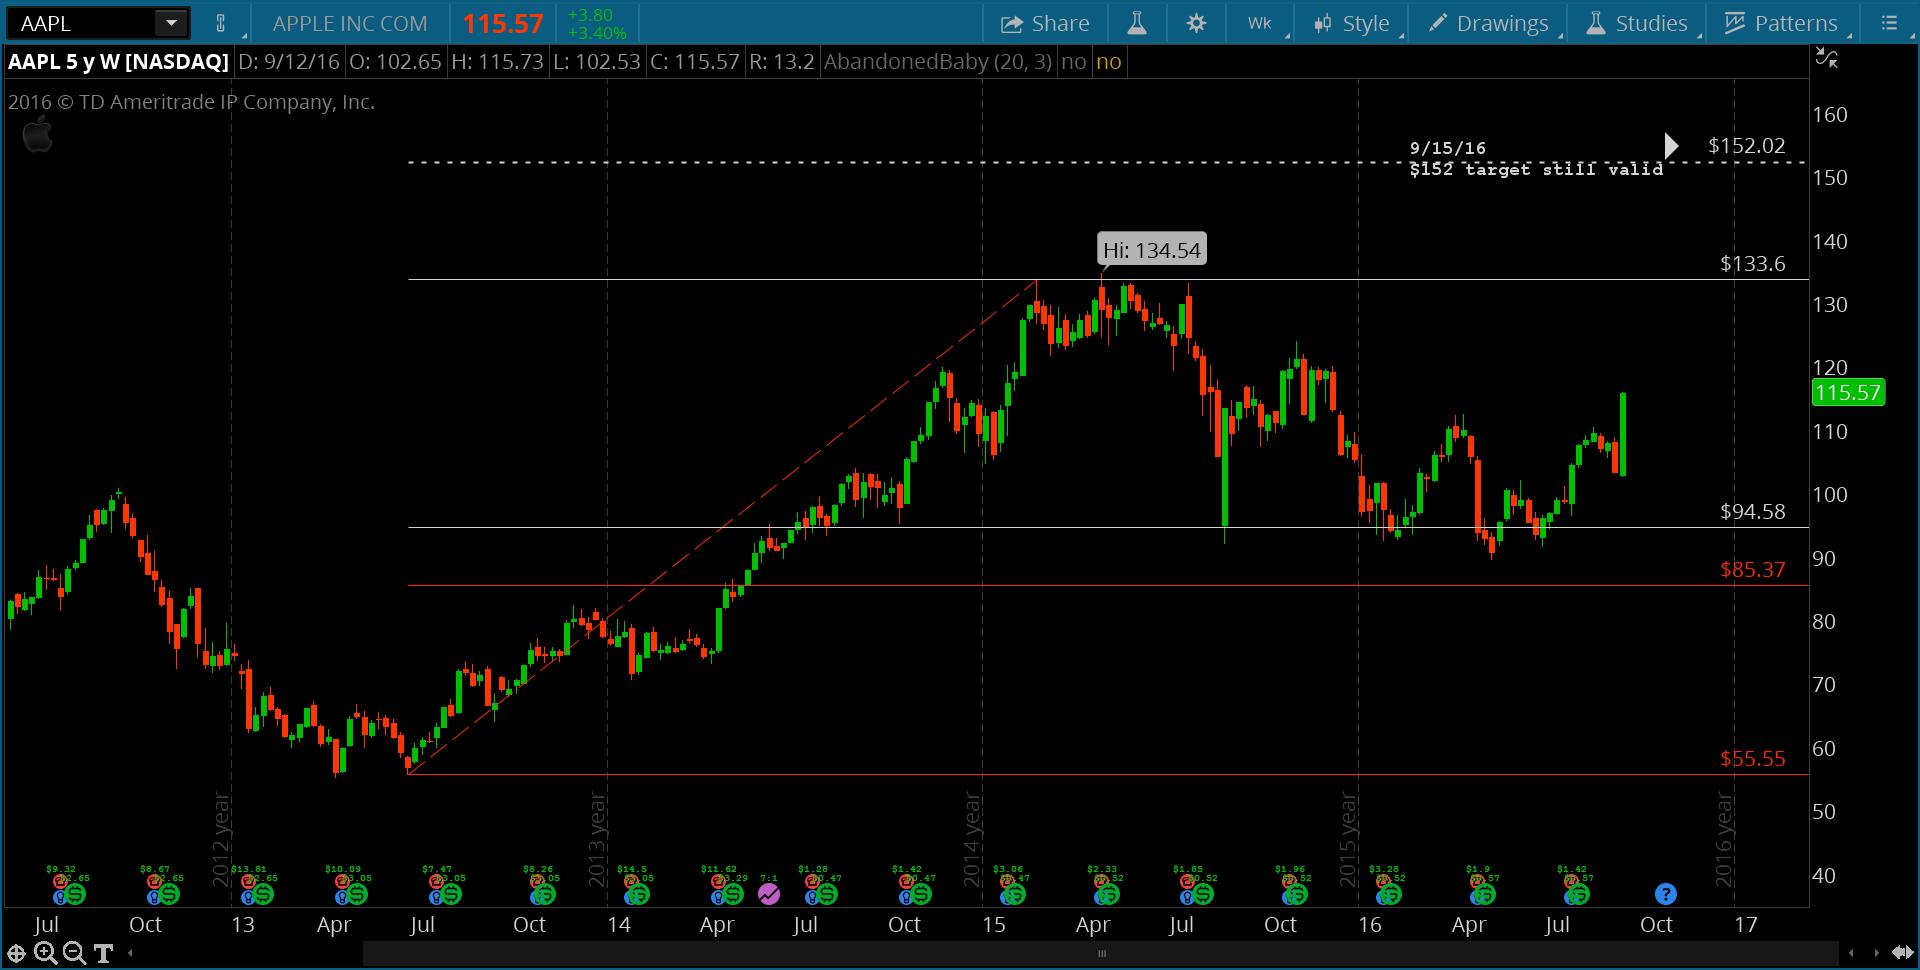 apple stock trading